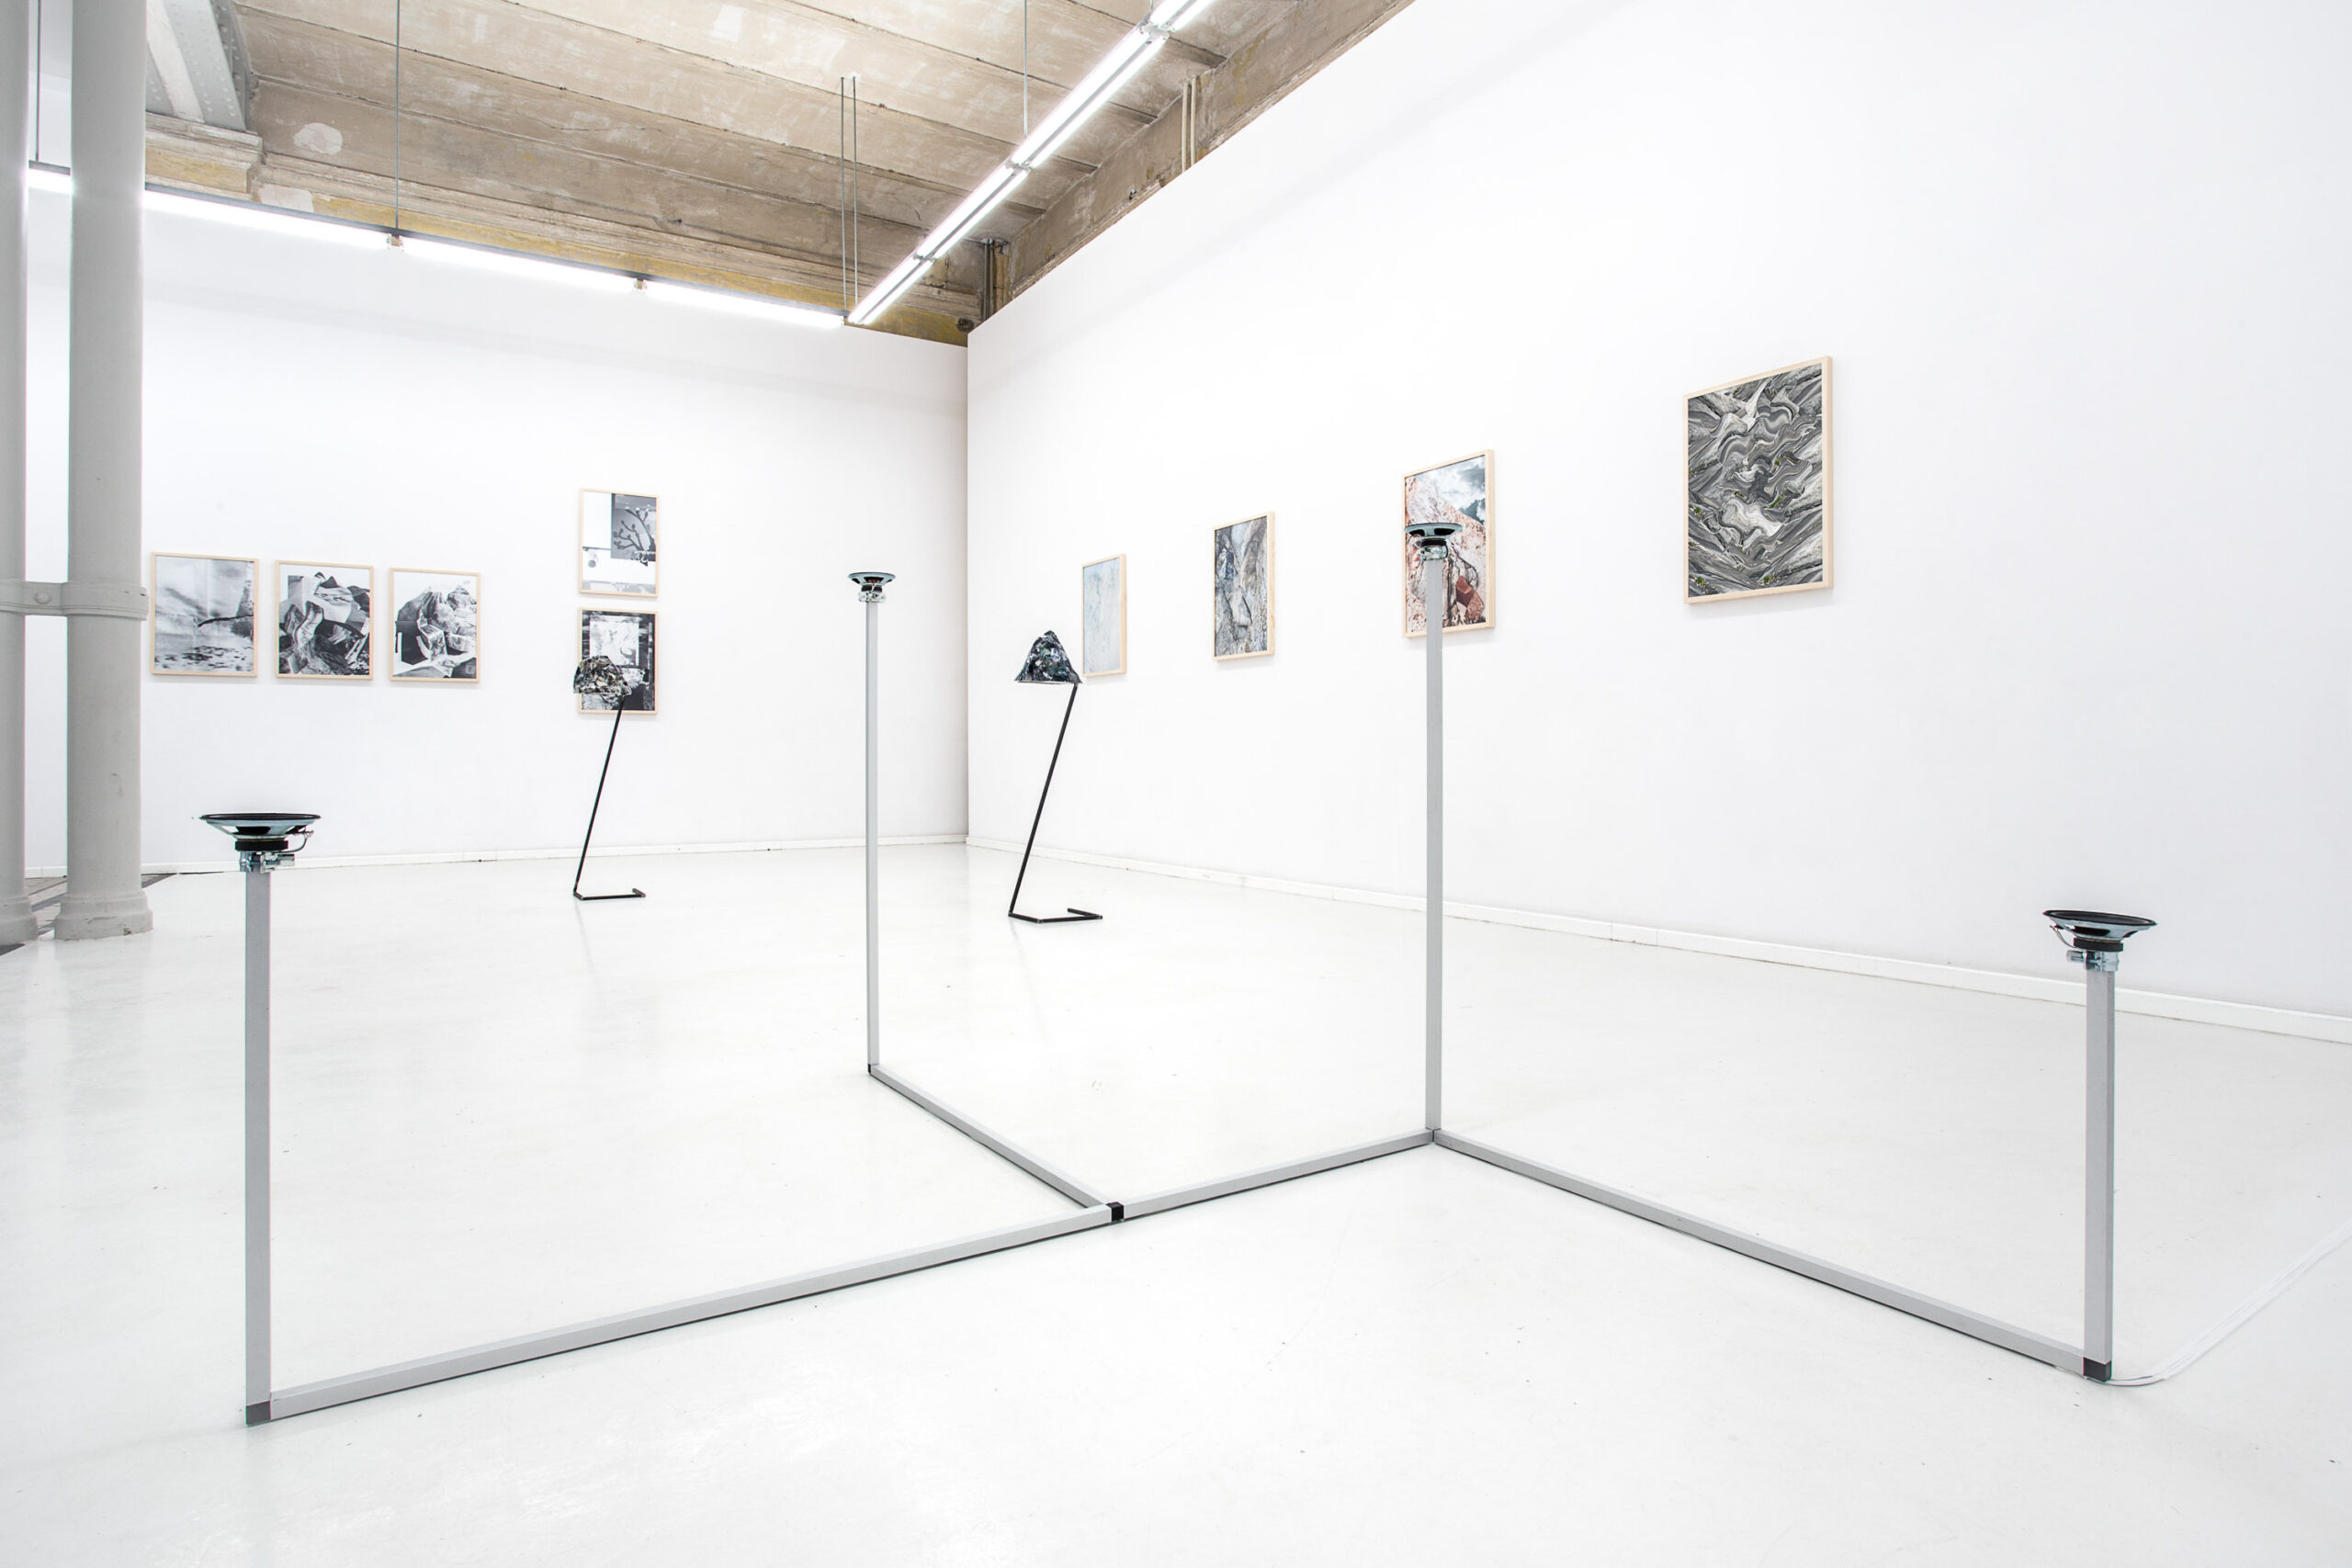 Jacek Doroszenko - How to travel - Sound installation - Sculpture - Exhibition - Gallery 02